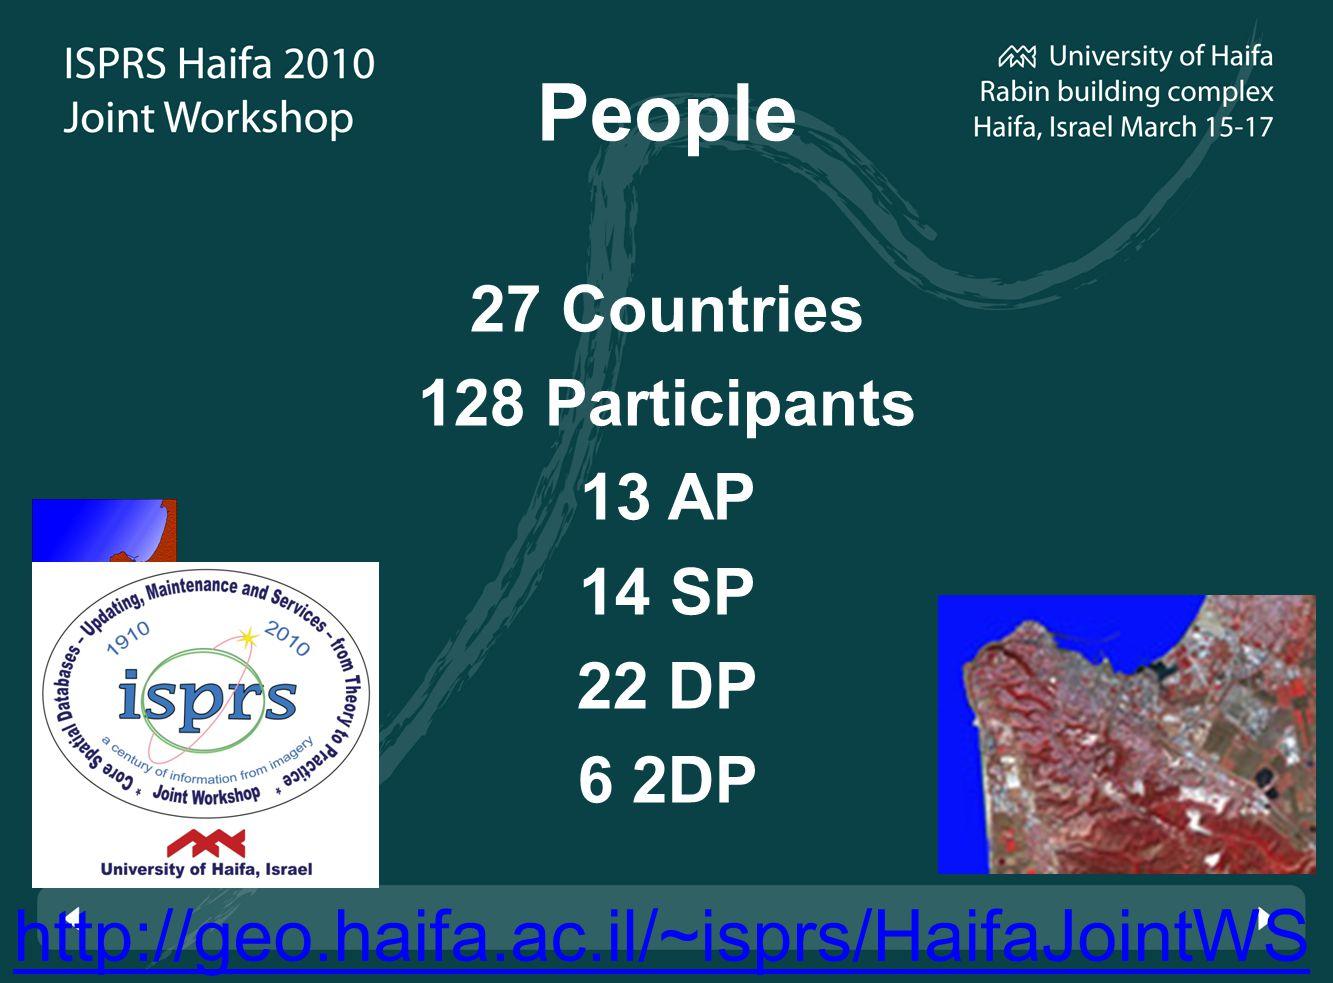 http://geo.haifa.ac.il/~isprs/HaifaJointWS People 27 Countries 128 Participants 13 AP 14 SP 22 DP 6 2DP